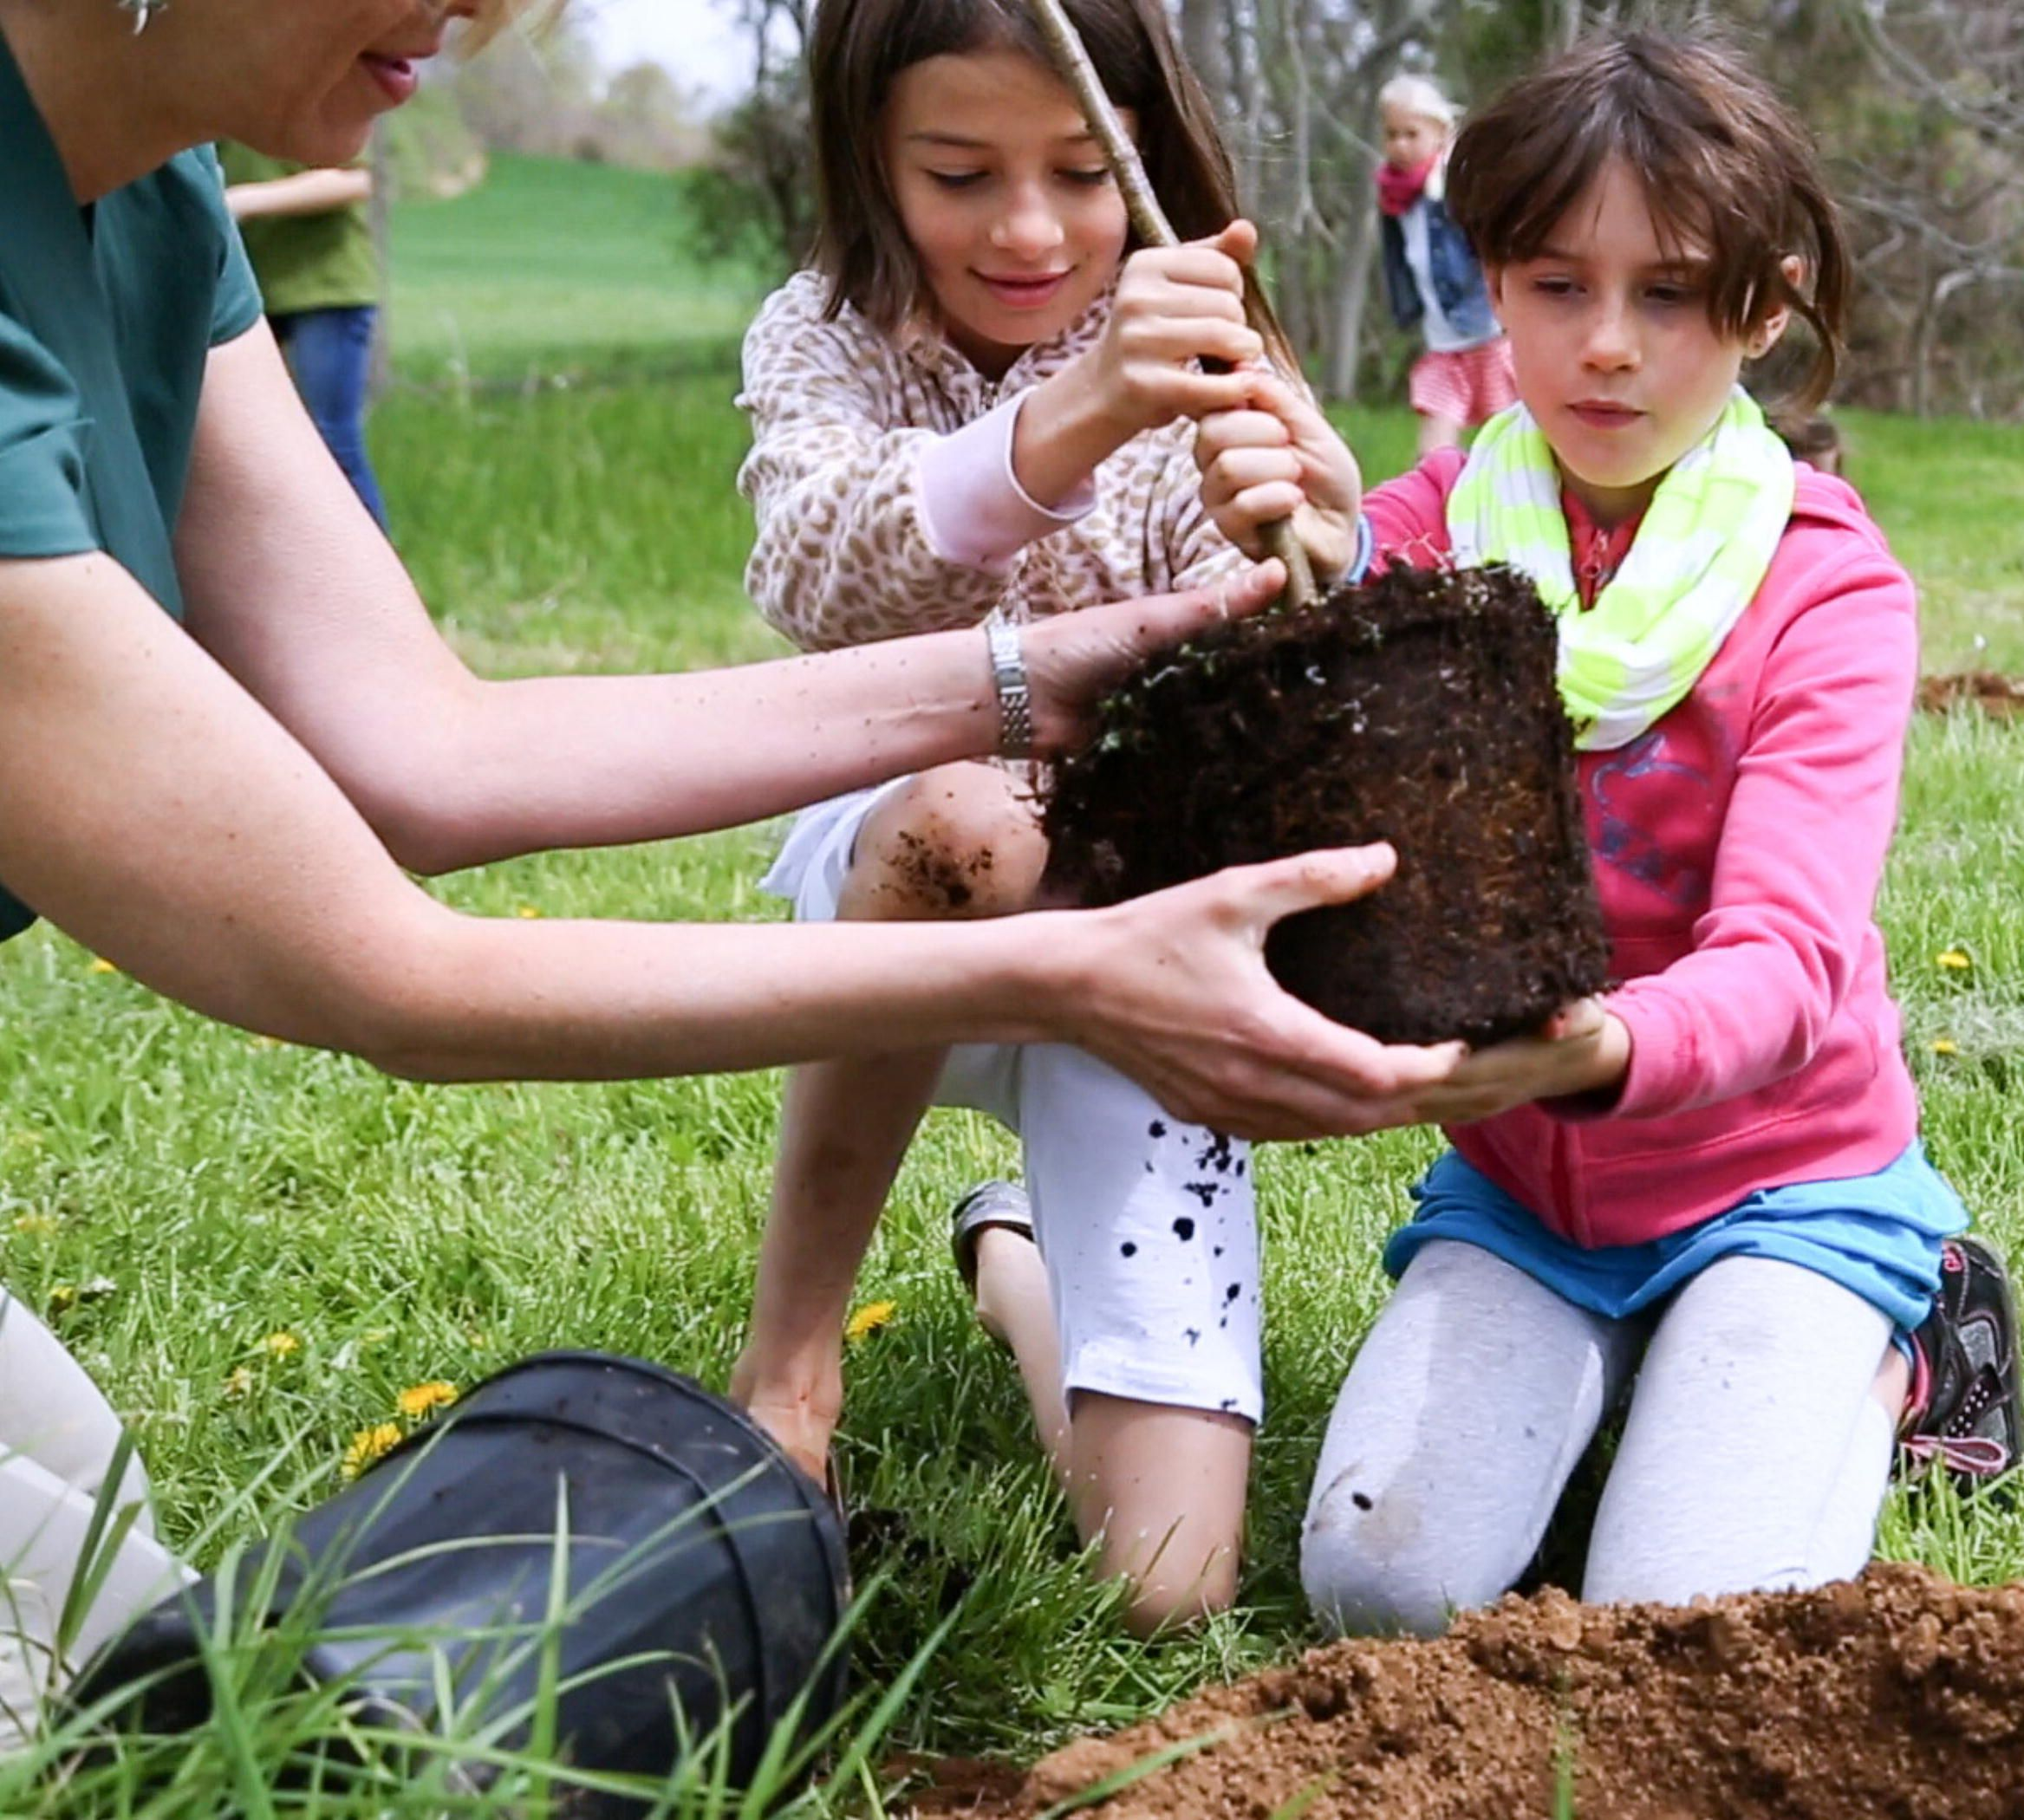 4-22-15 Earth Day Saving My Tomorrow HBO